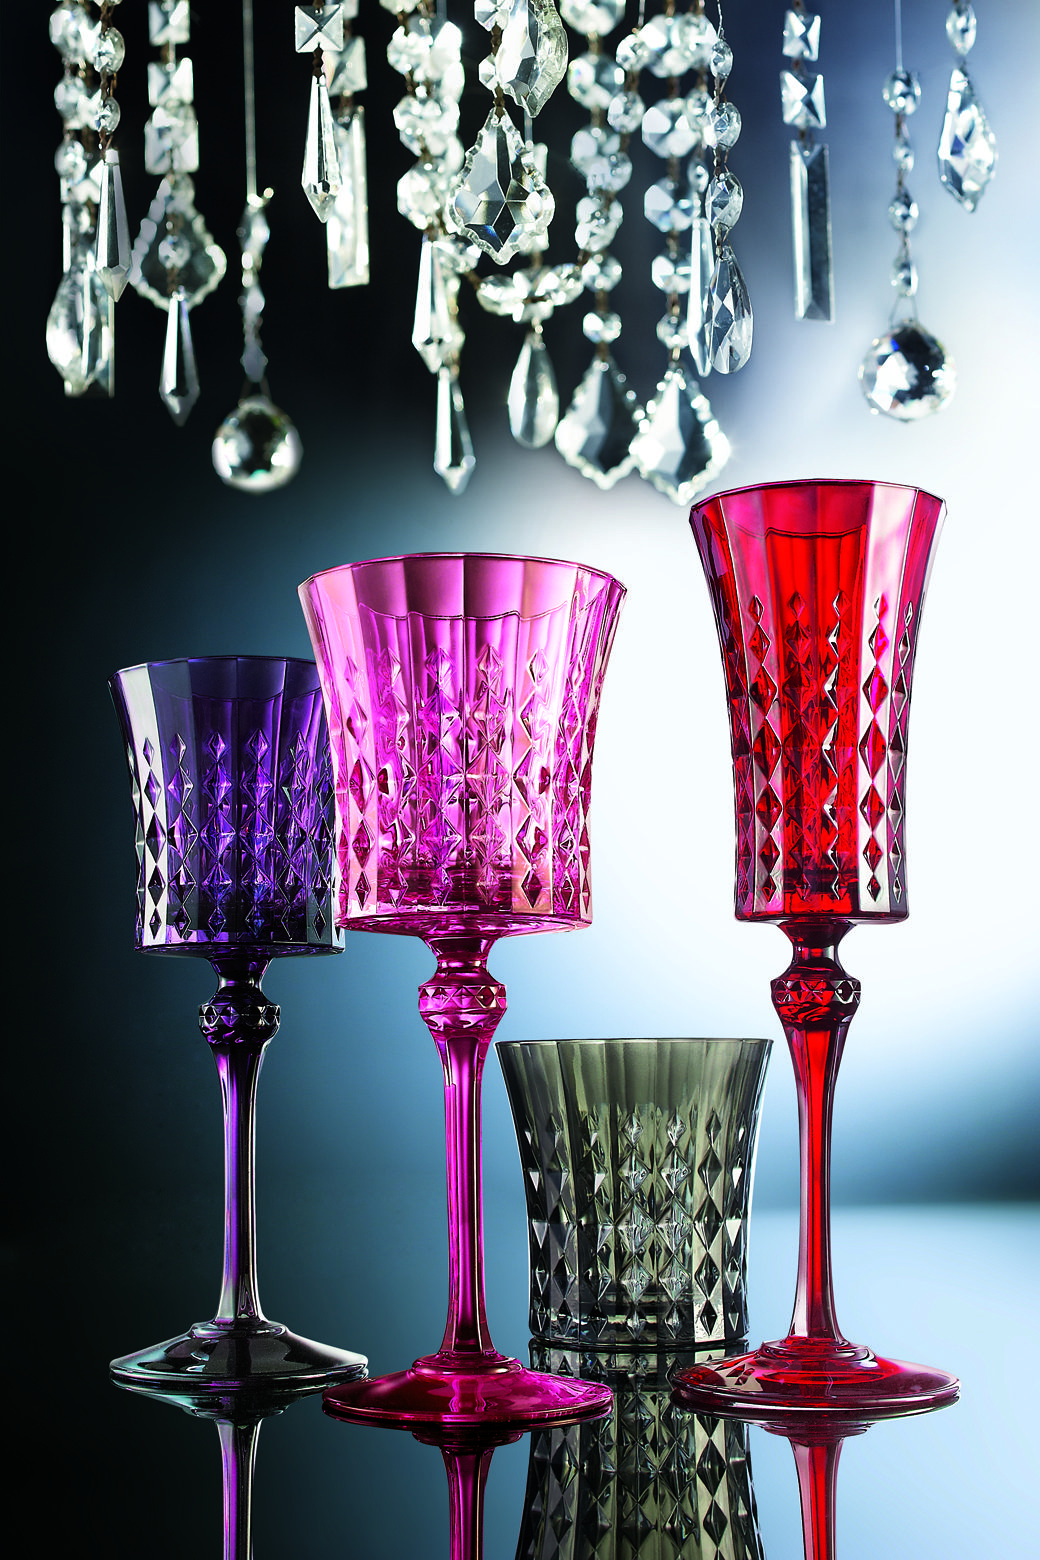 Cristal Darques Lady Diamond.Cristal D Arques Paris Lady Diamond Range Now In Colors Drinkware